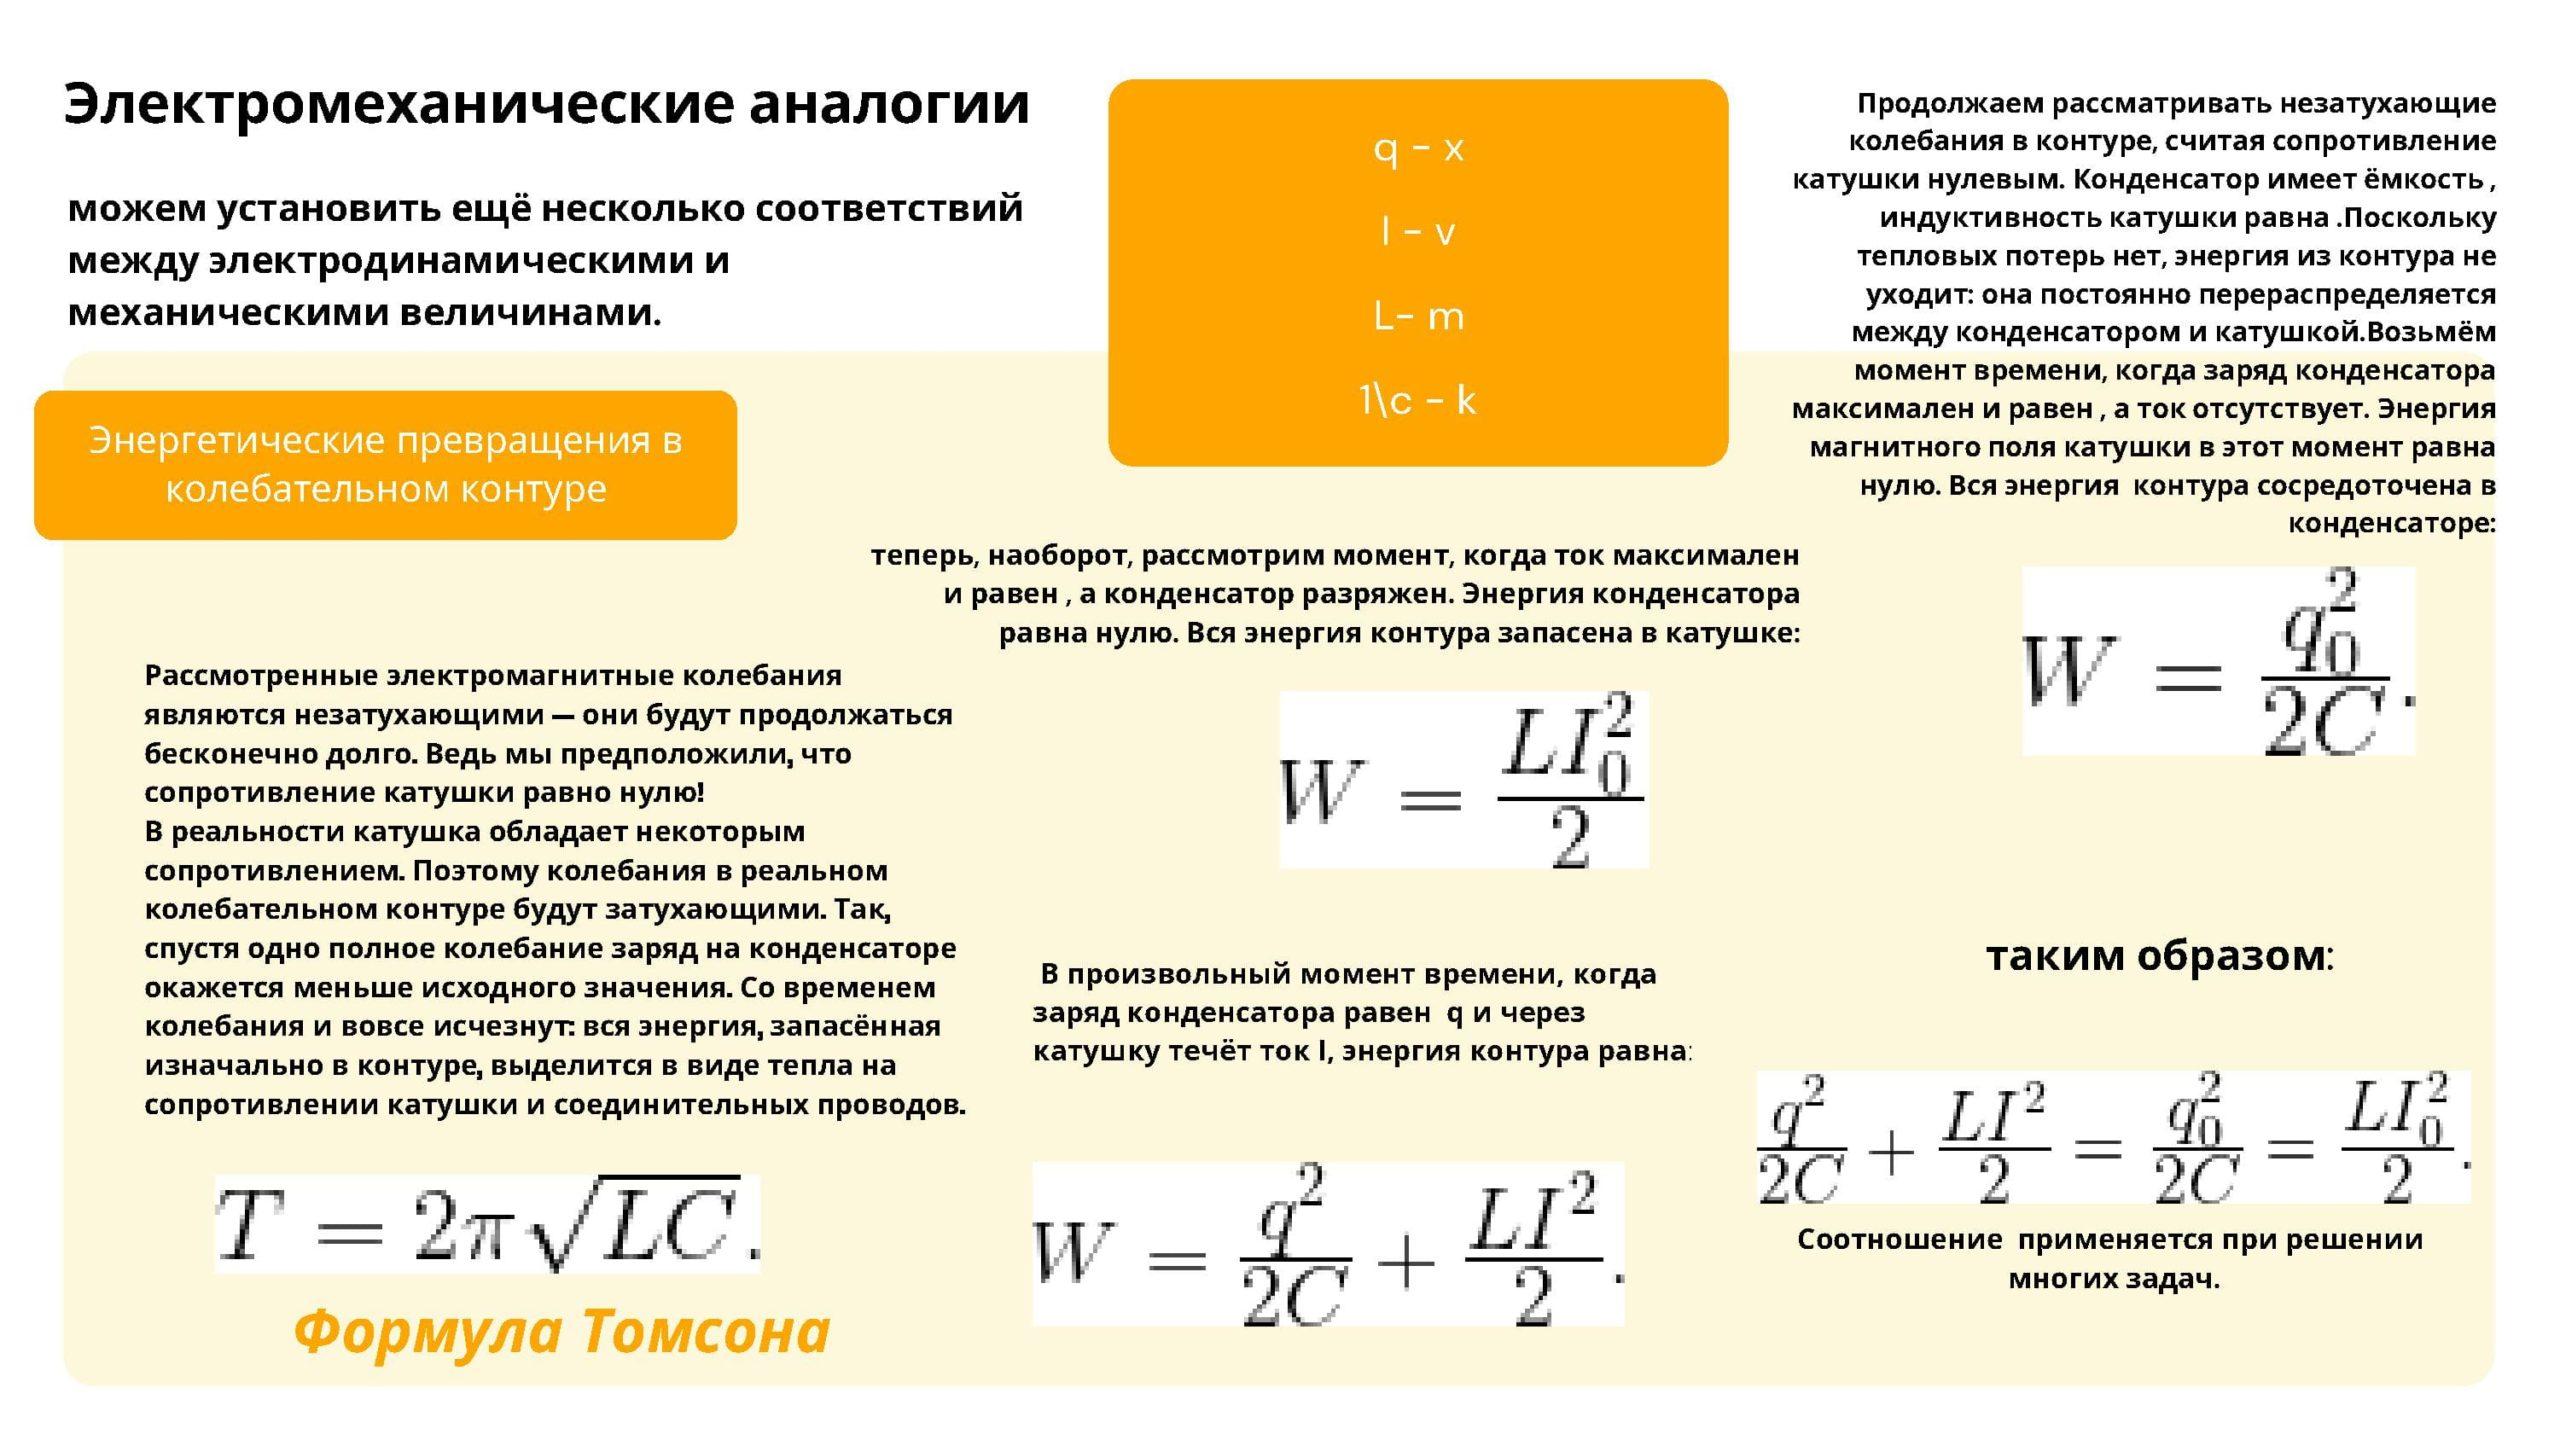 Электромеханические аналоги